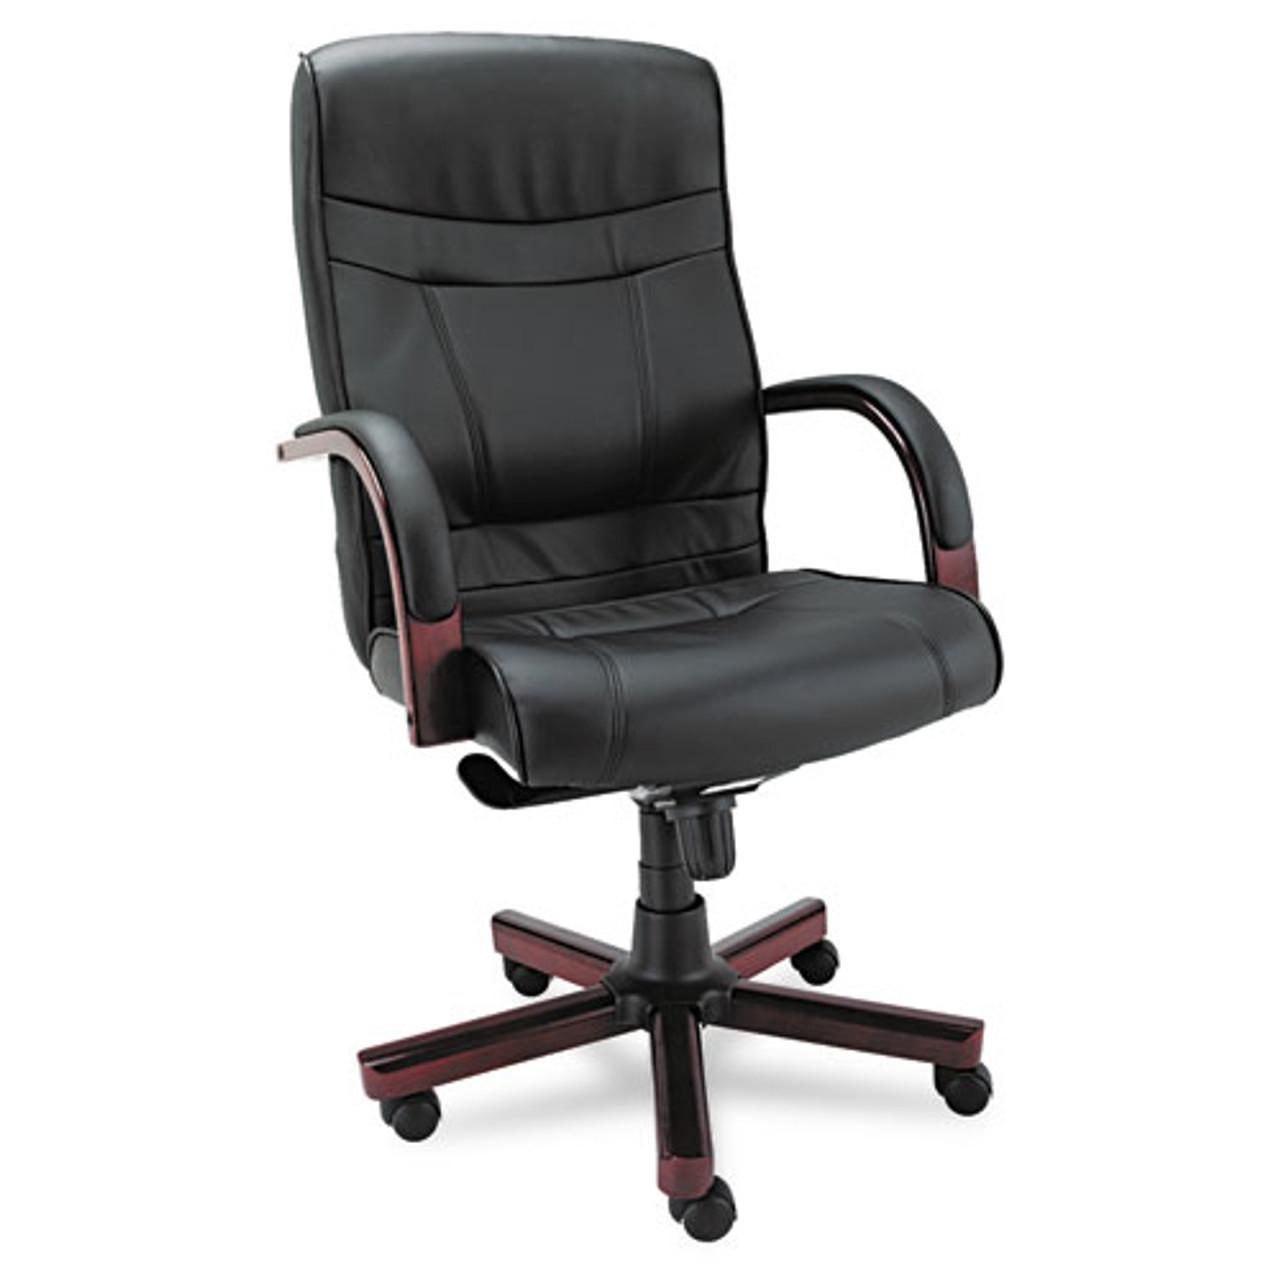 Madaris Series High-Back Knee Tilt Leather Chair Wood Trim, Black/mahogany, #AL-1214